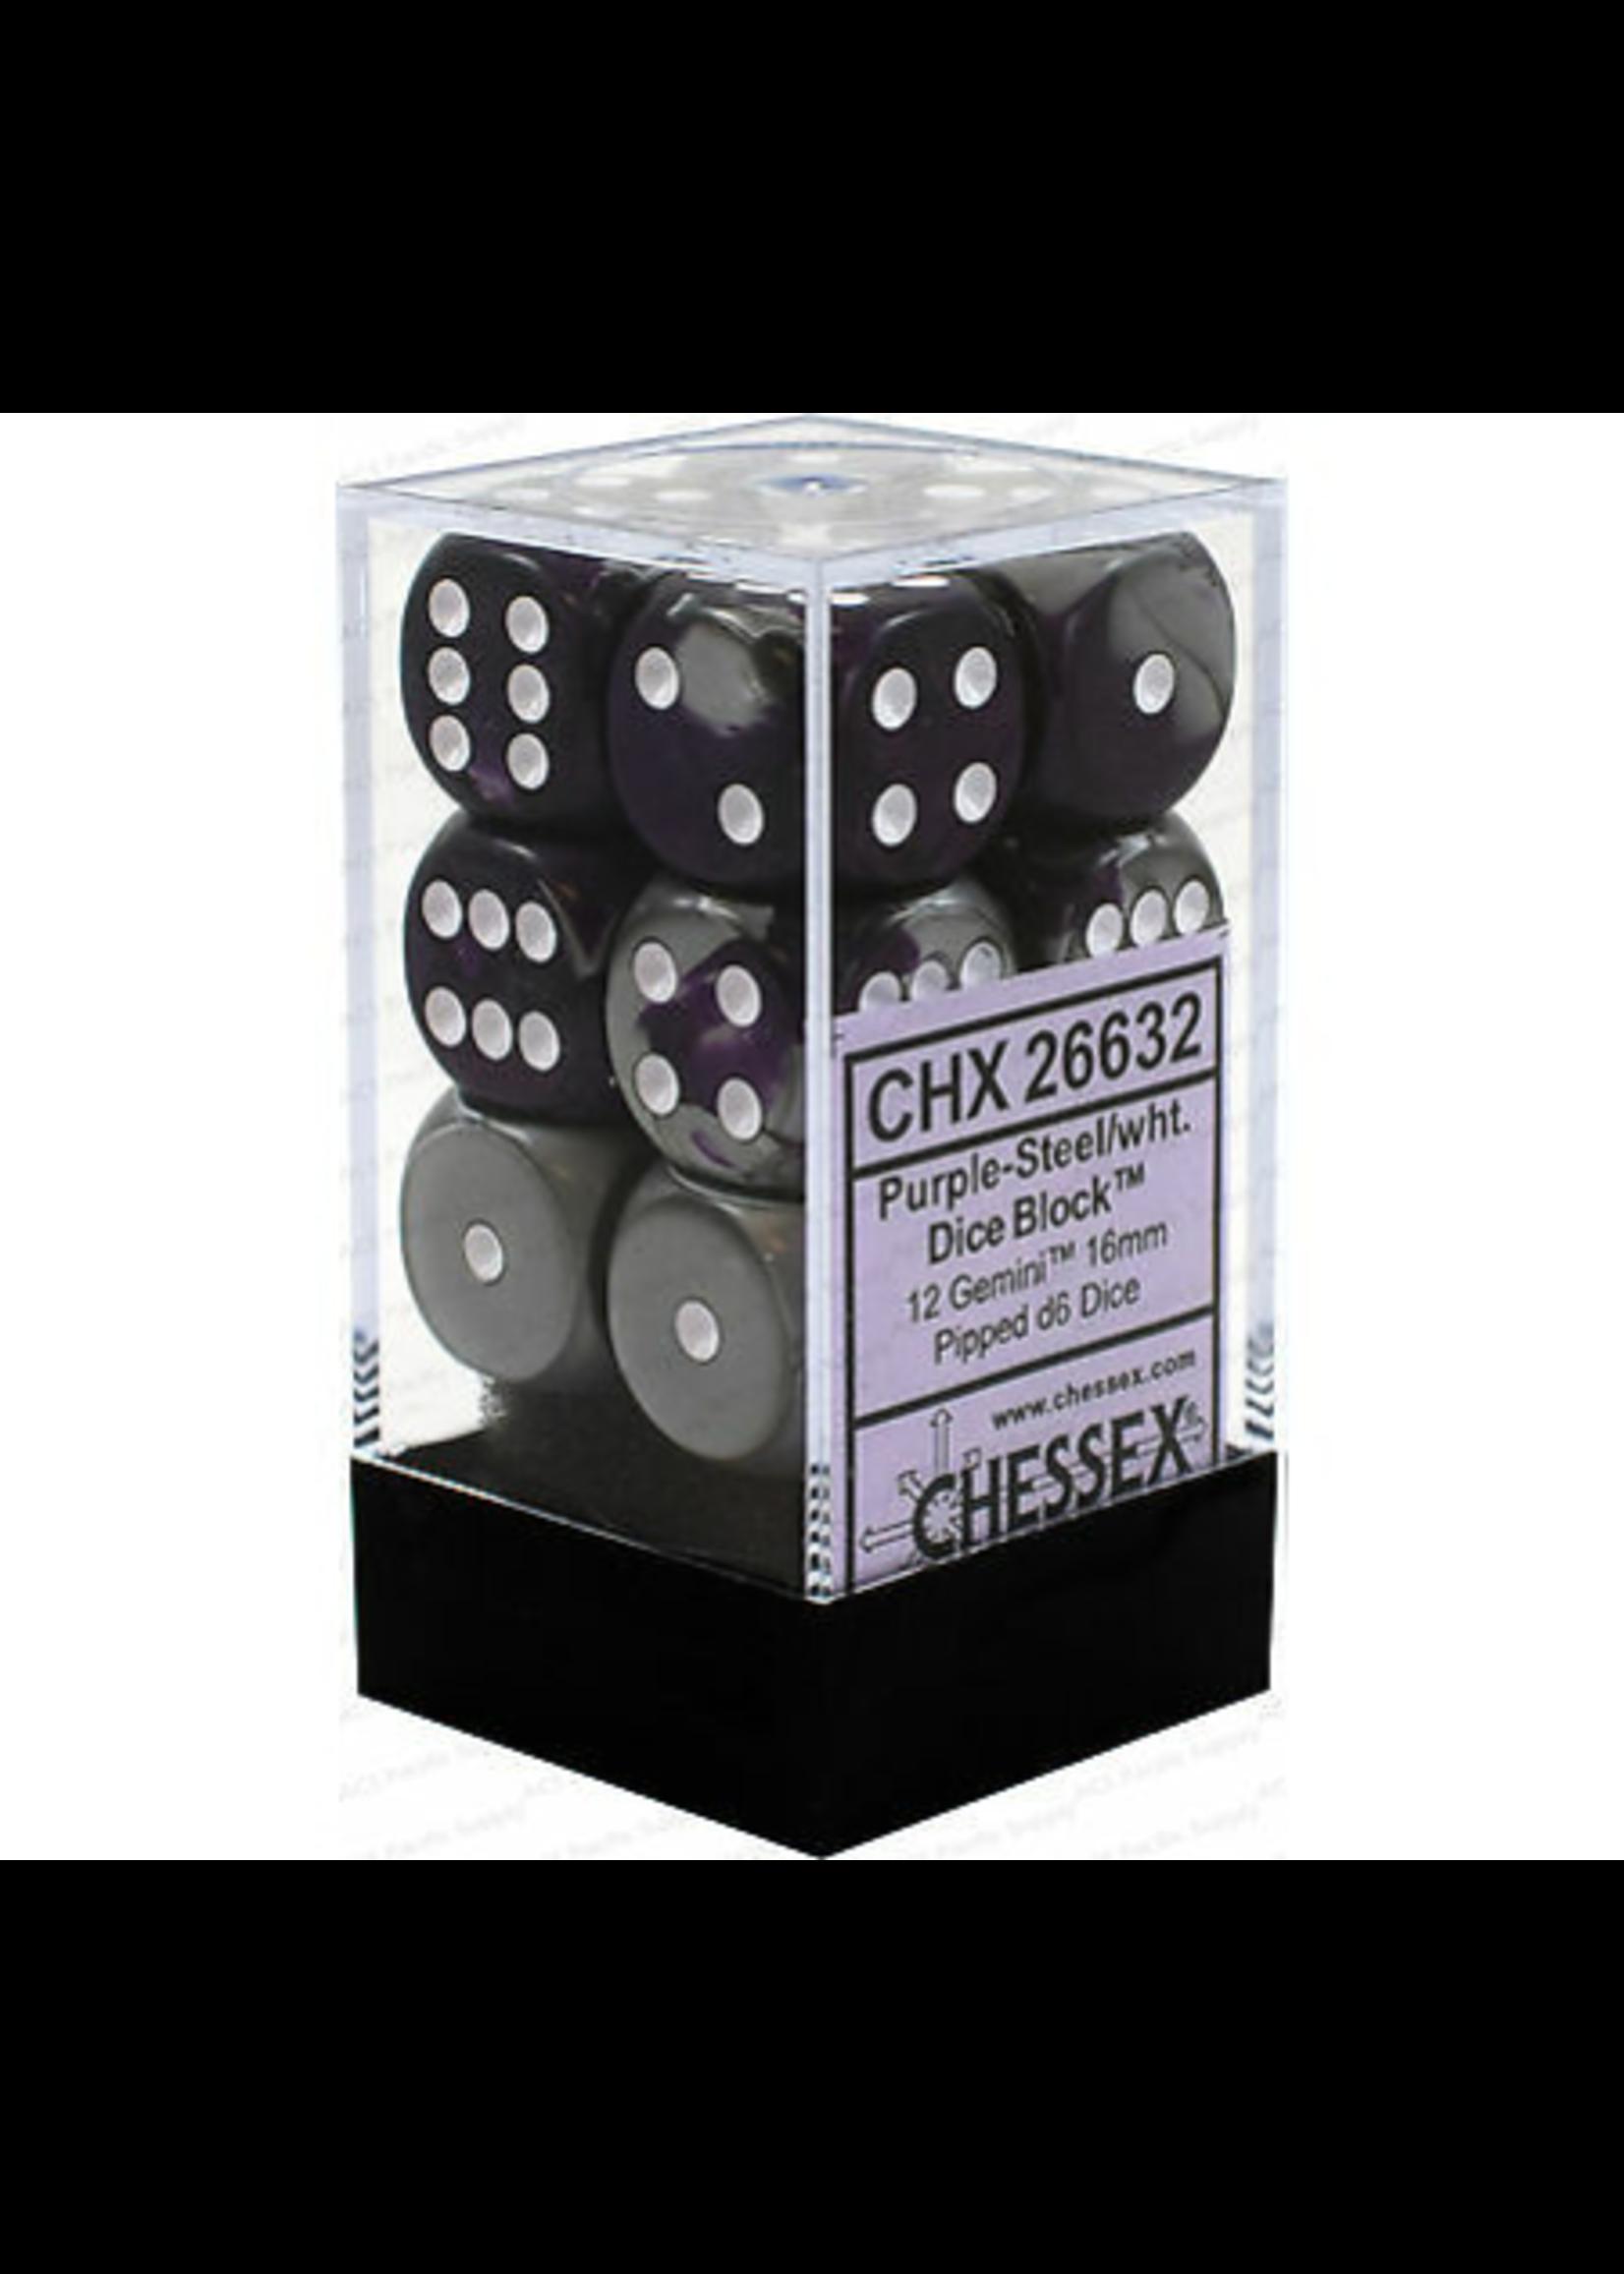 Chessex d6 Cube 16mm Gemini Purple & Steel w/ White (12)